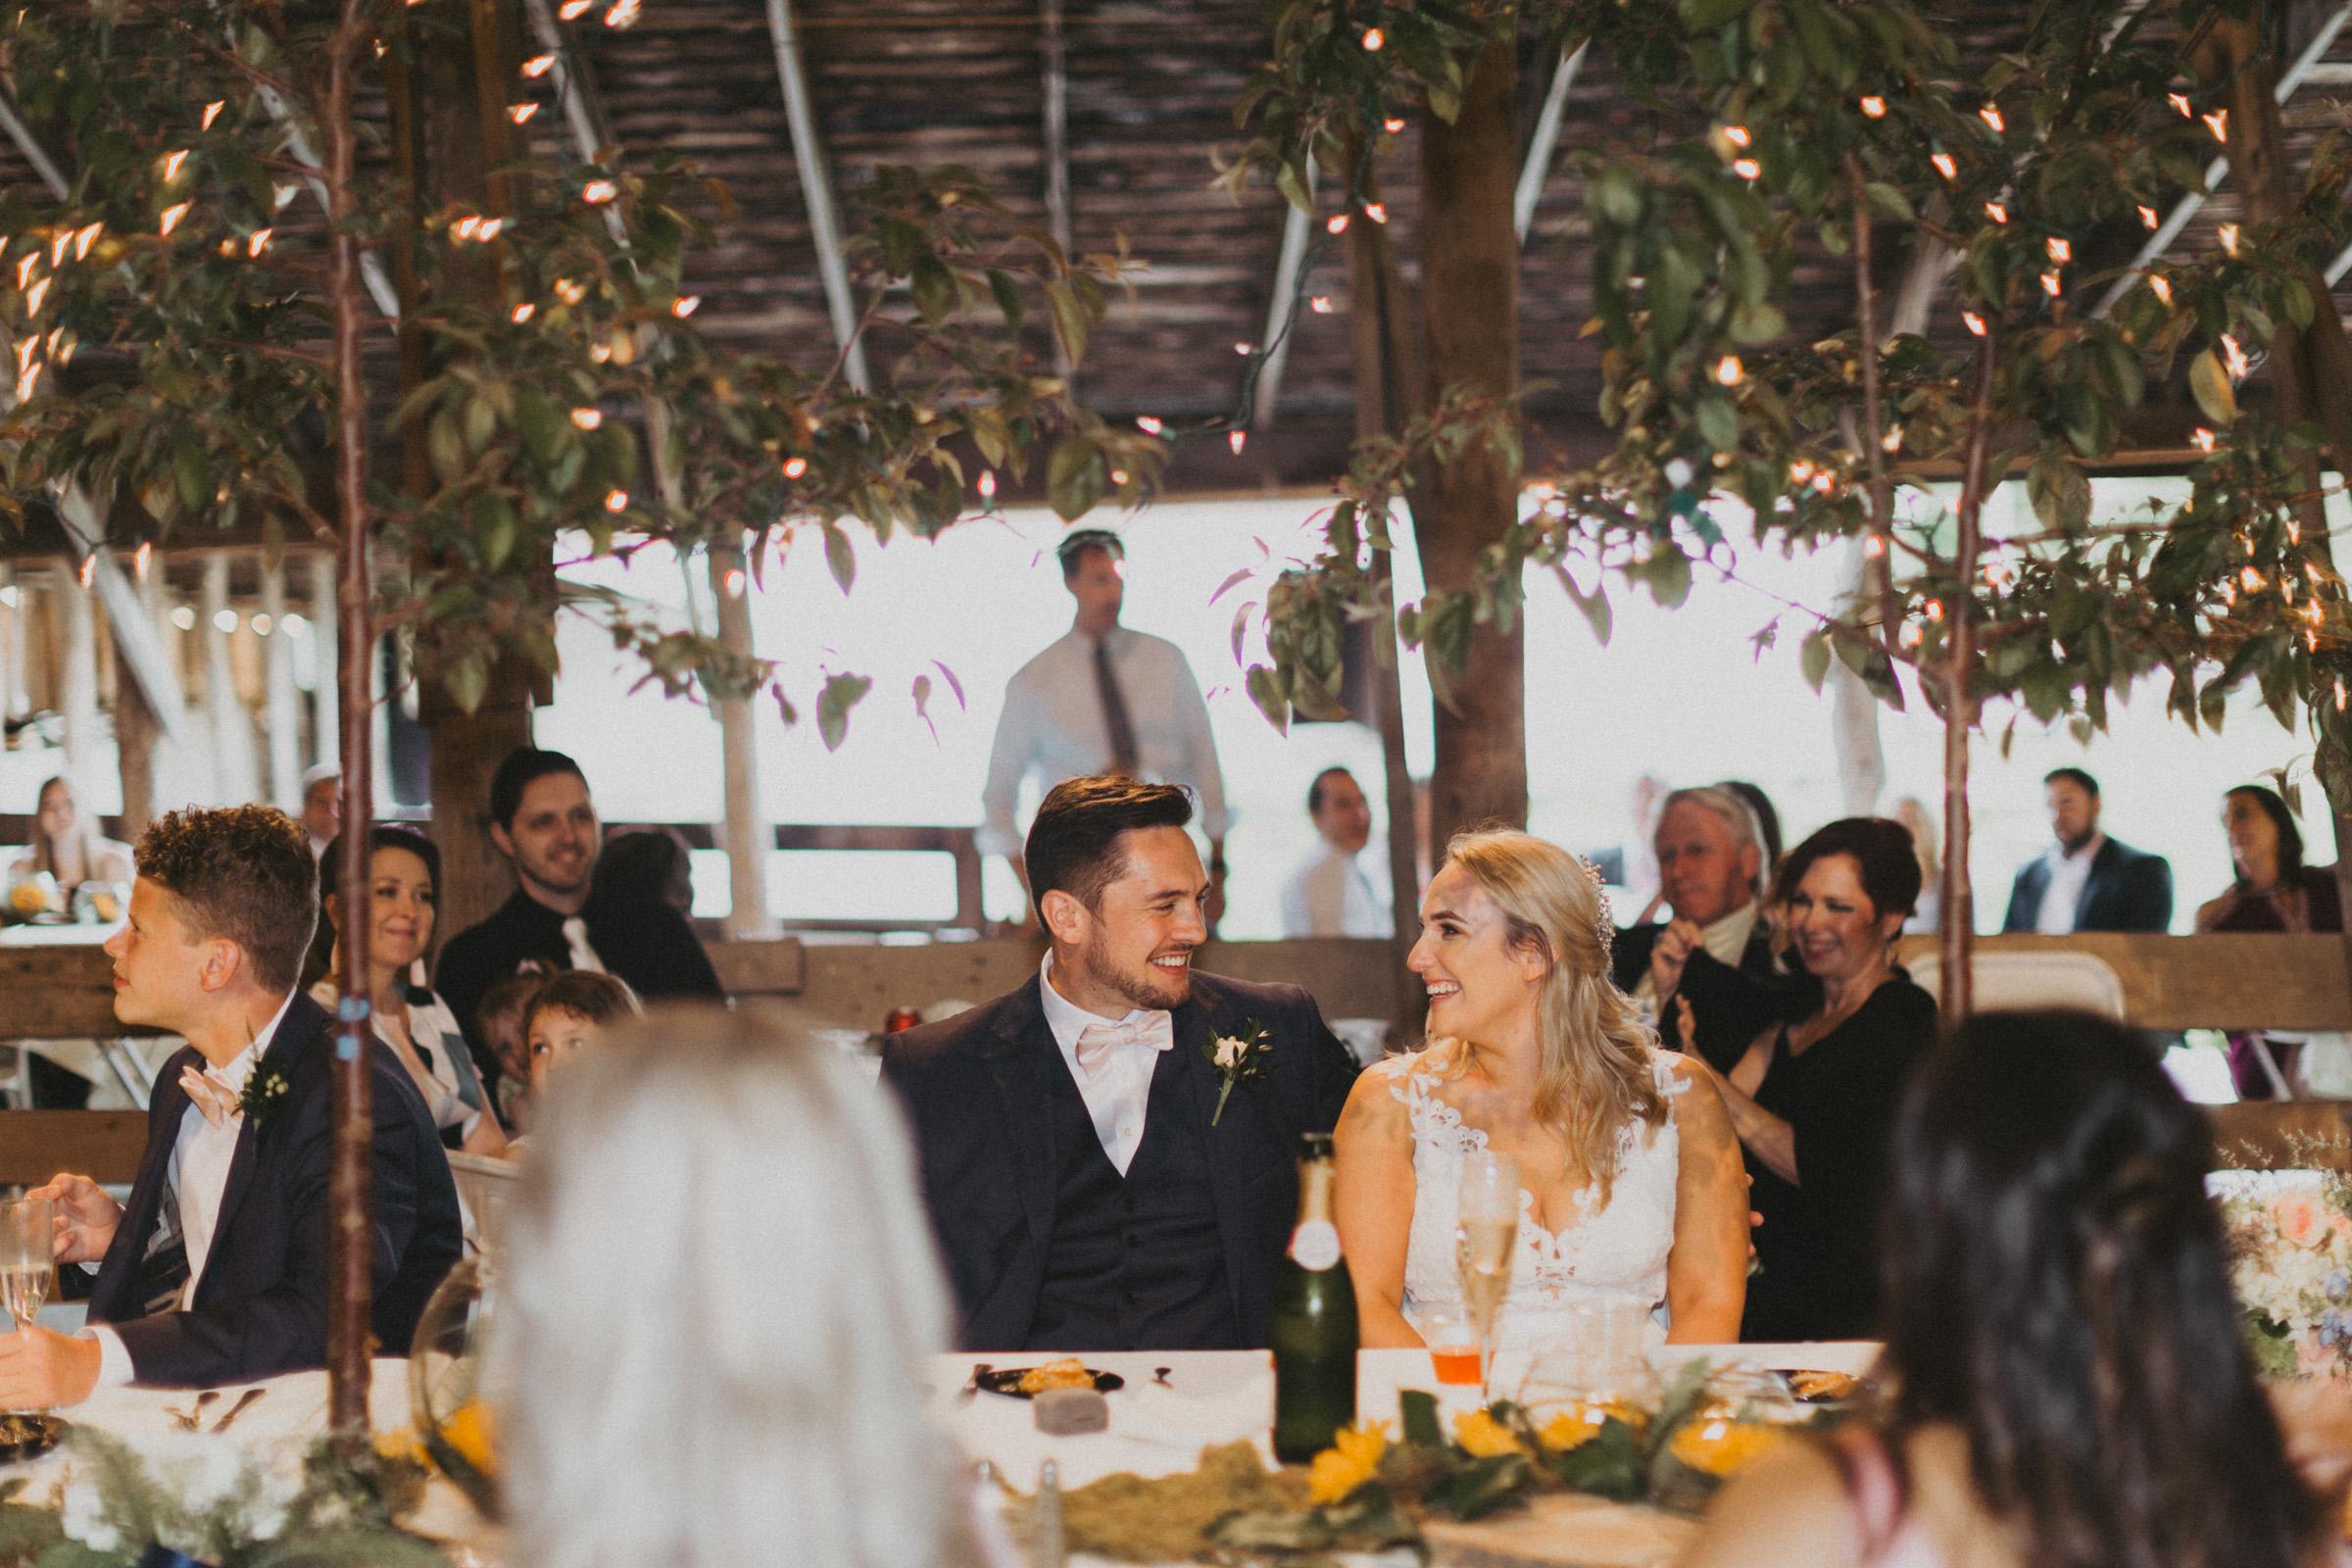 alyssa barletter photography nelson wedding nebraska city lied lodge morton barn spring wedding photographer-56.jpg